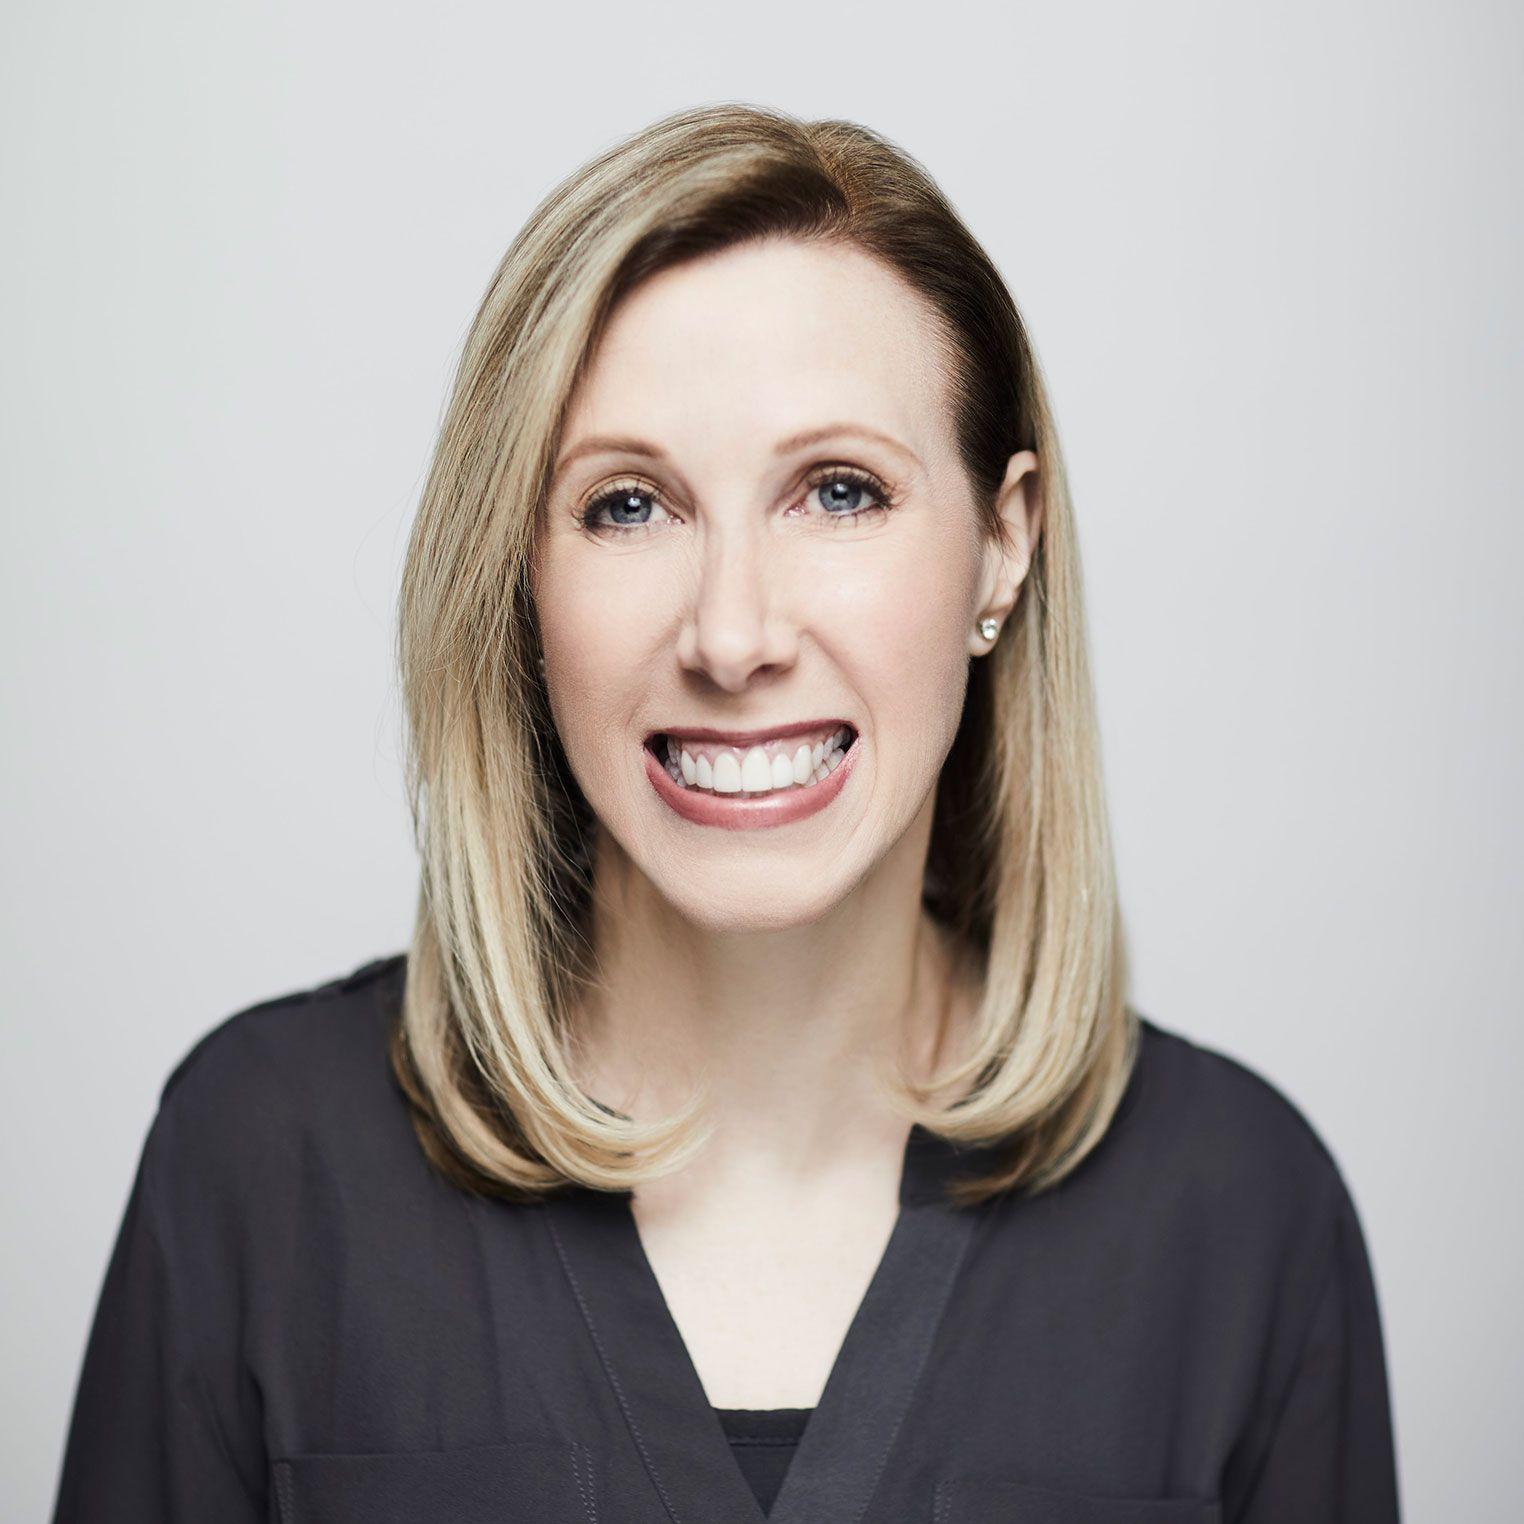 Heather Torreggiani